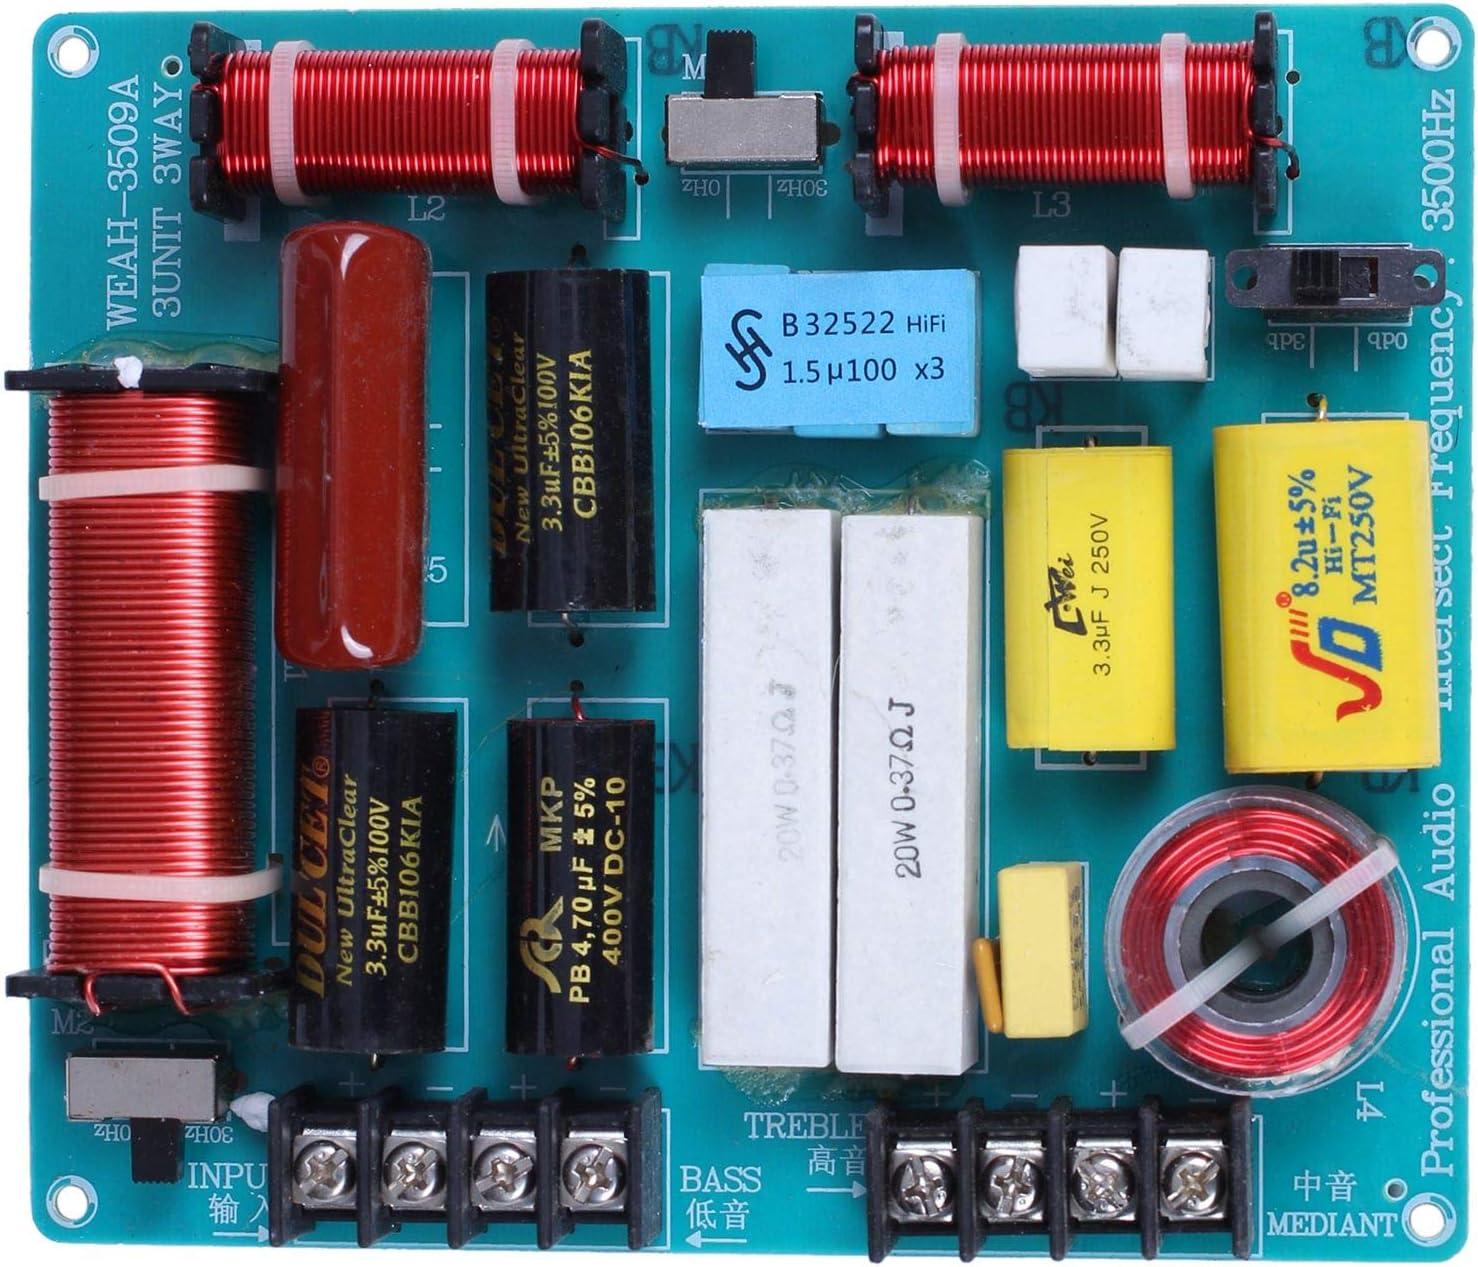 Fltaheroo 1Pc 350W 3 Ways Crossover Audio Board Tweeter+Mediant+Bass Frequency Divider for 4-8Ohm DIY Ktv Stage Speaker Filter